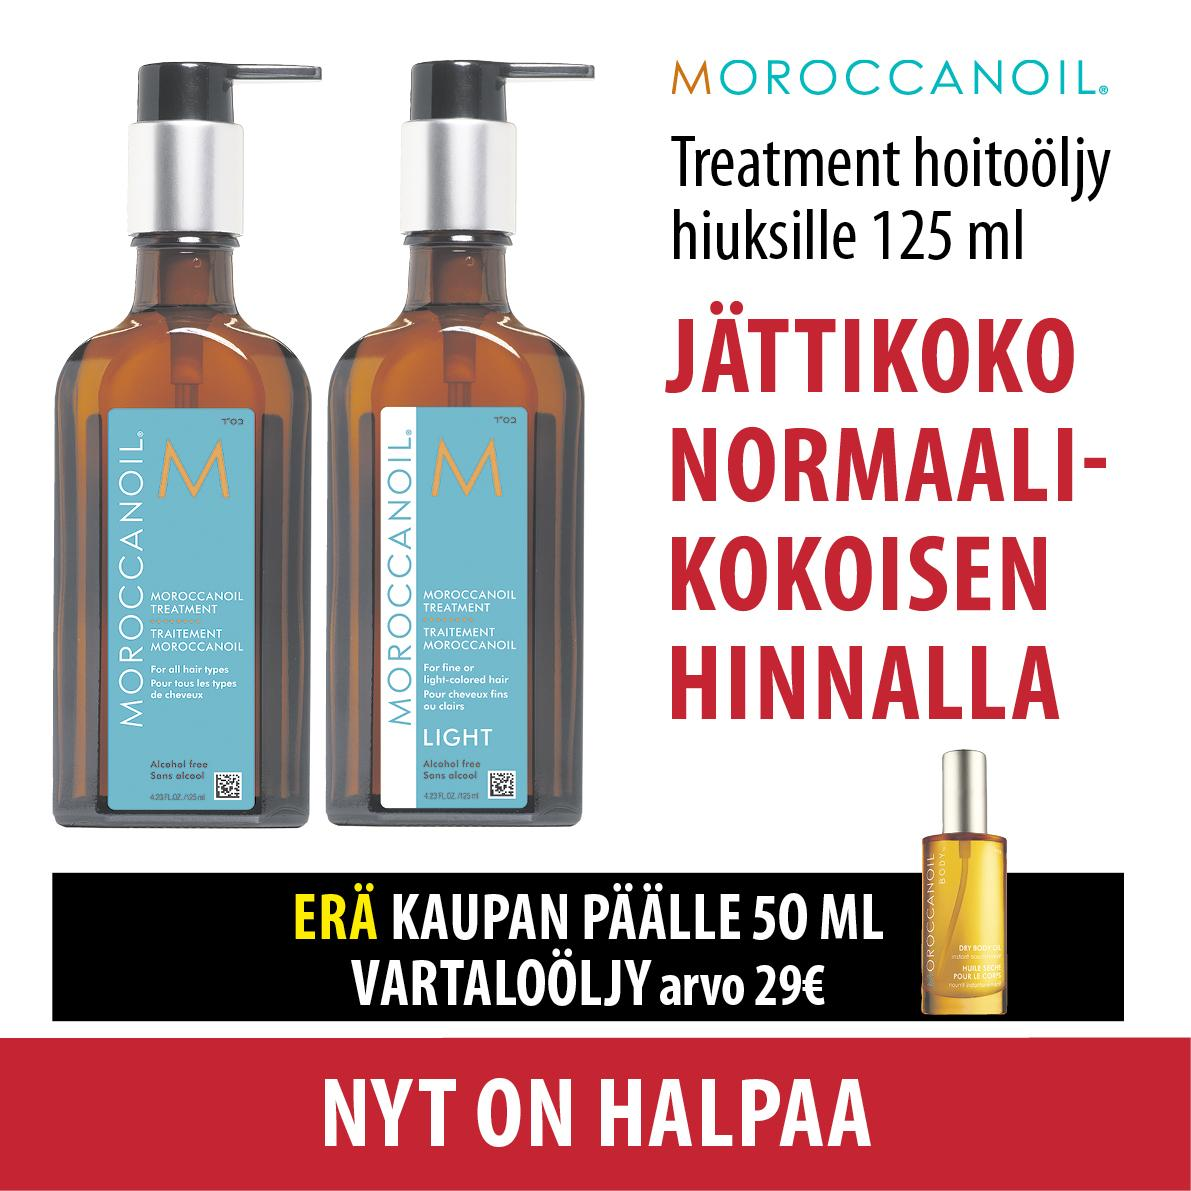 Moroccanoil hoitooly vartalovoide 420x420